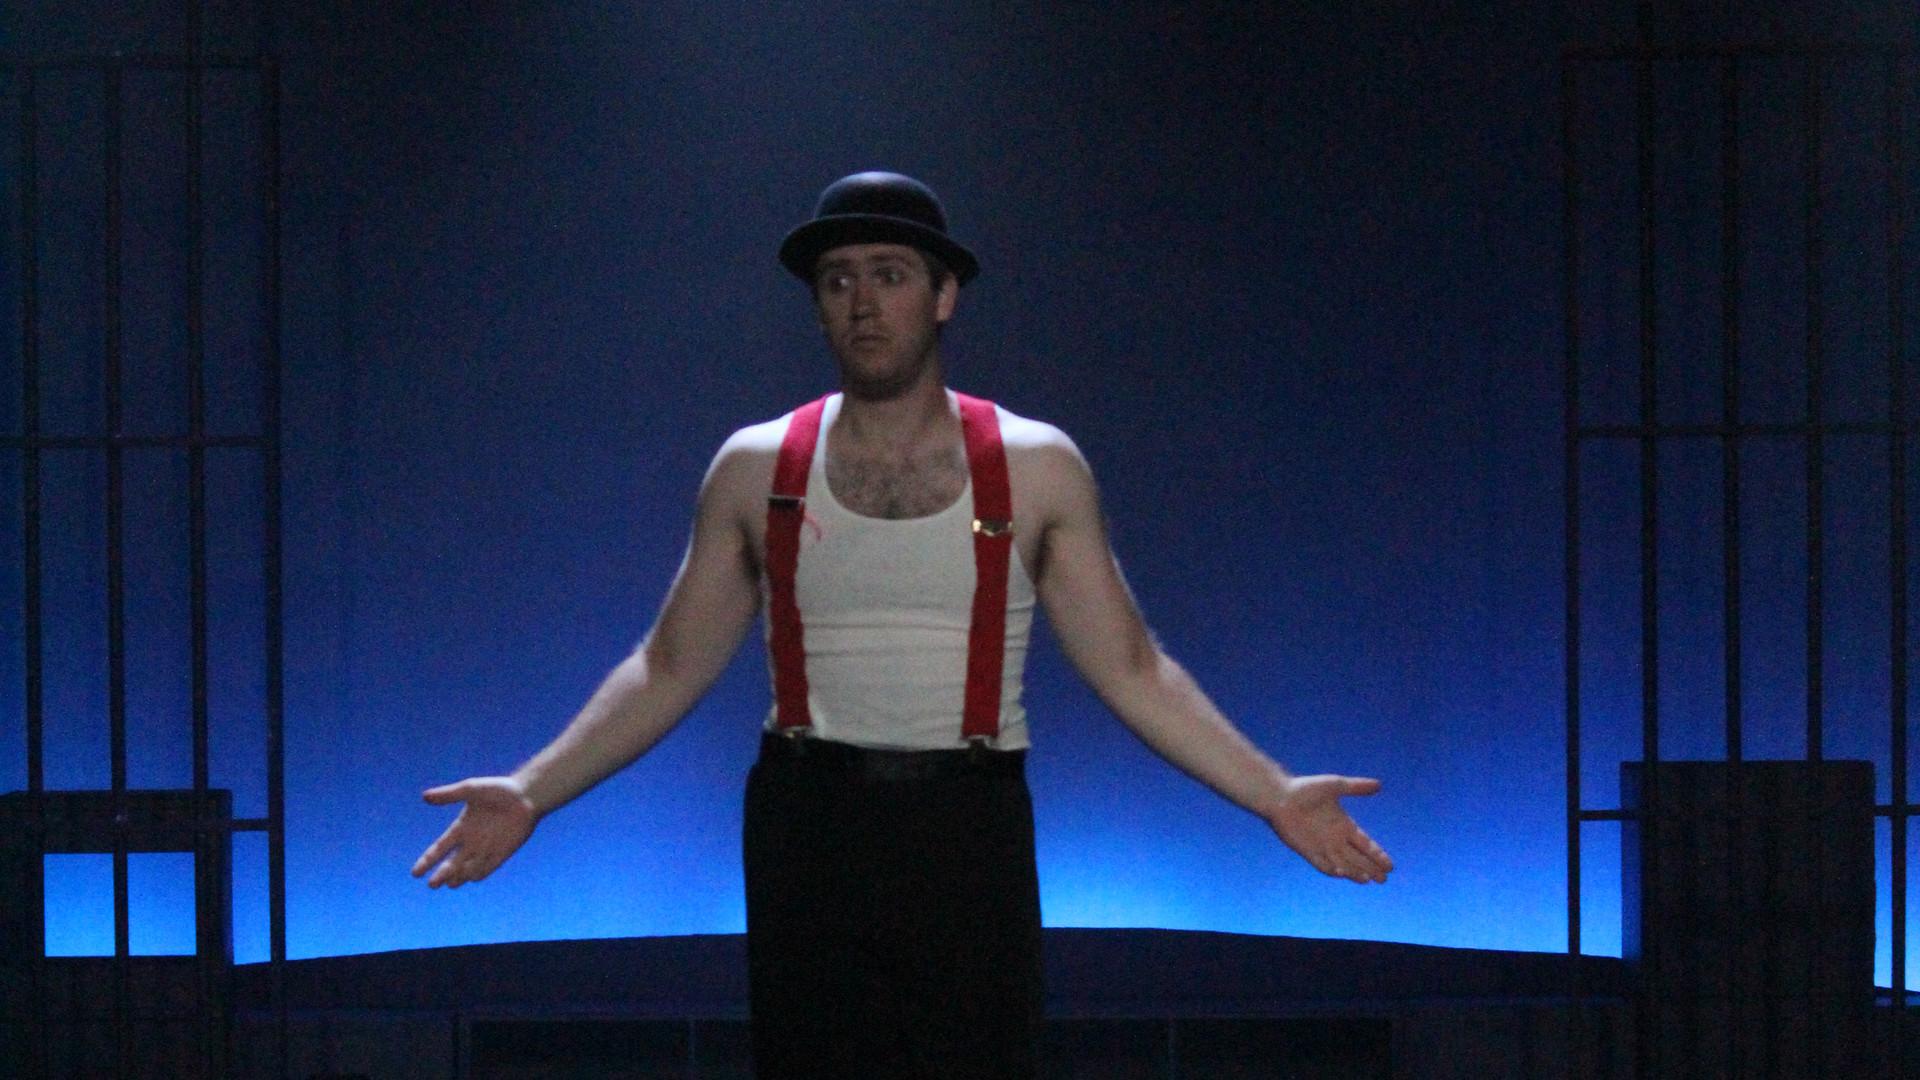 Mr. Cellophane